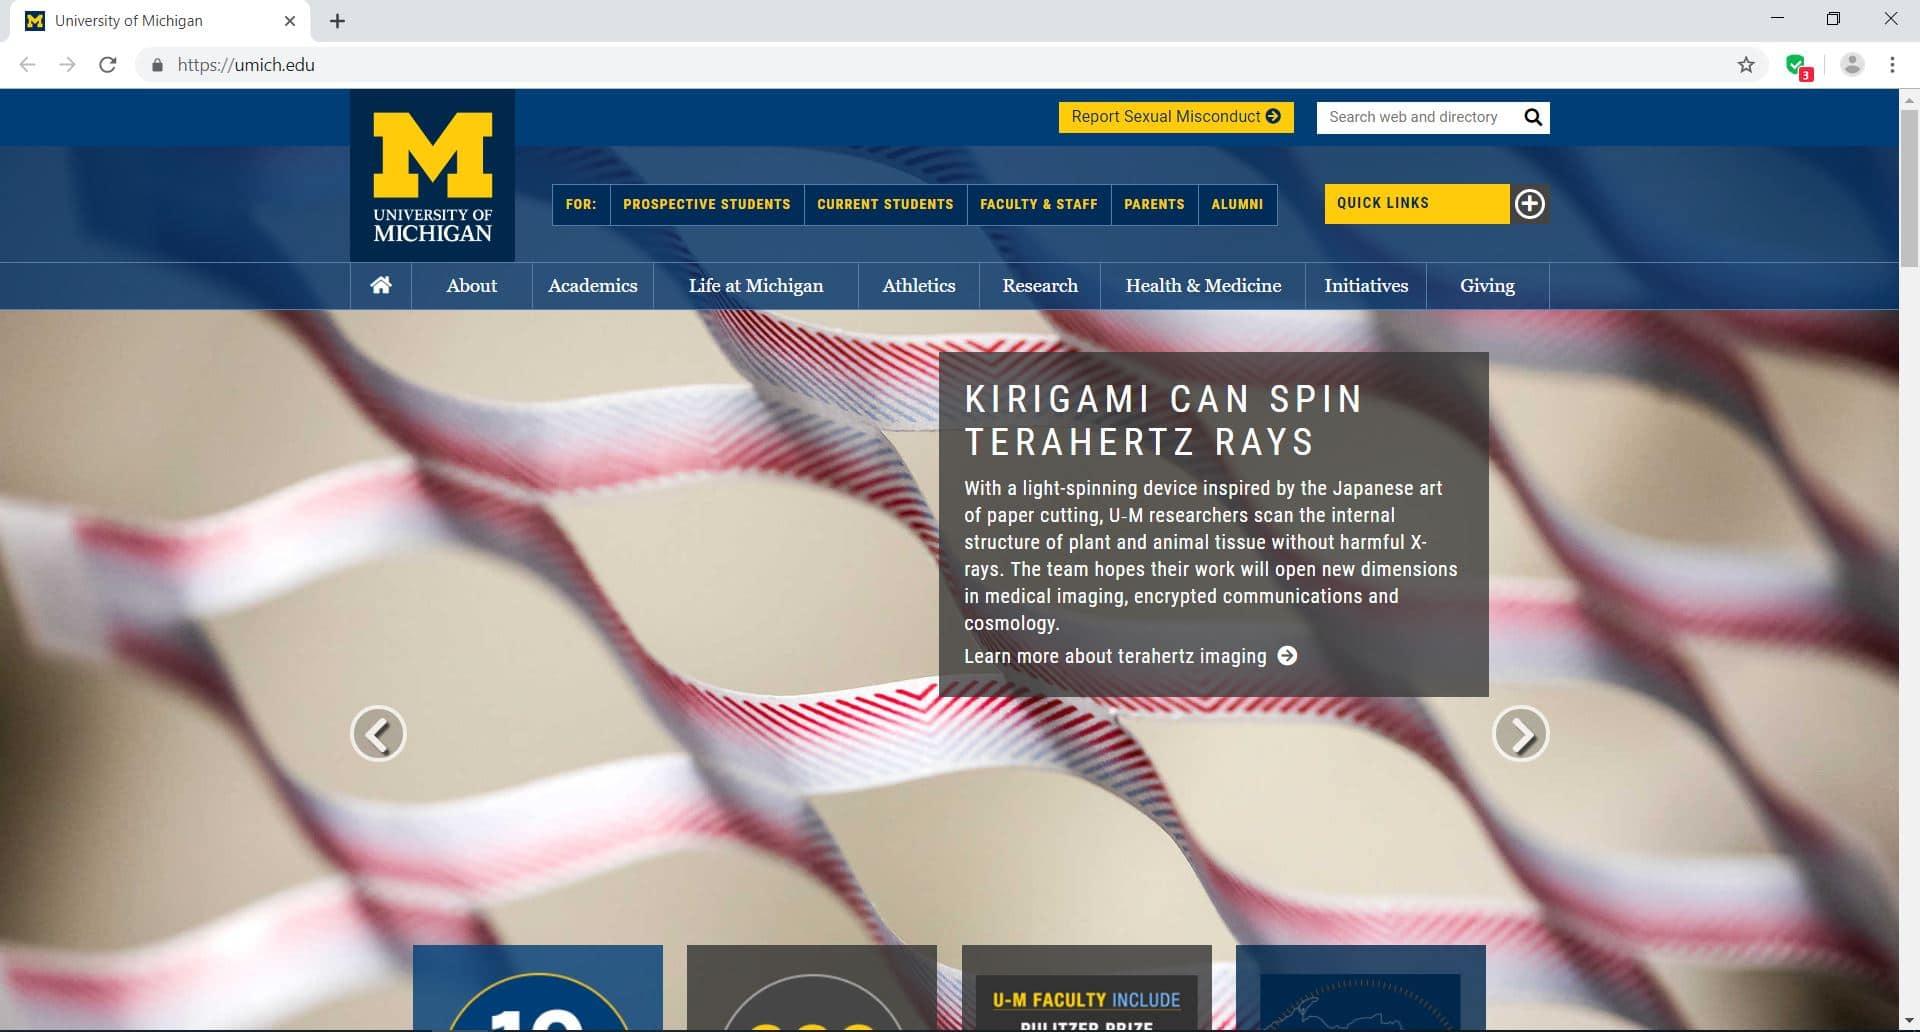 official website of University of Michigan – Ann Arbor